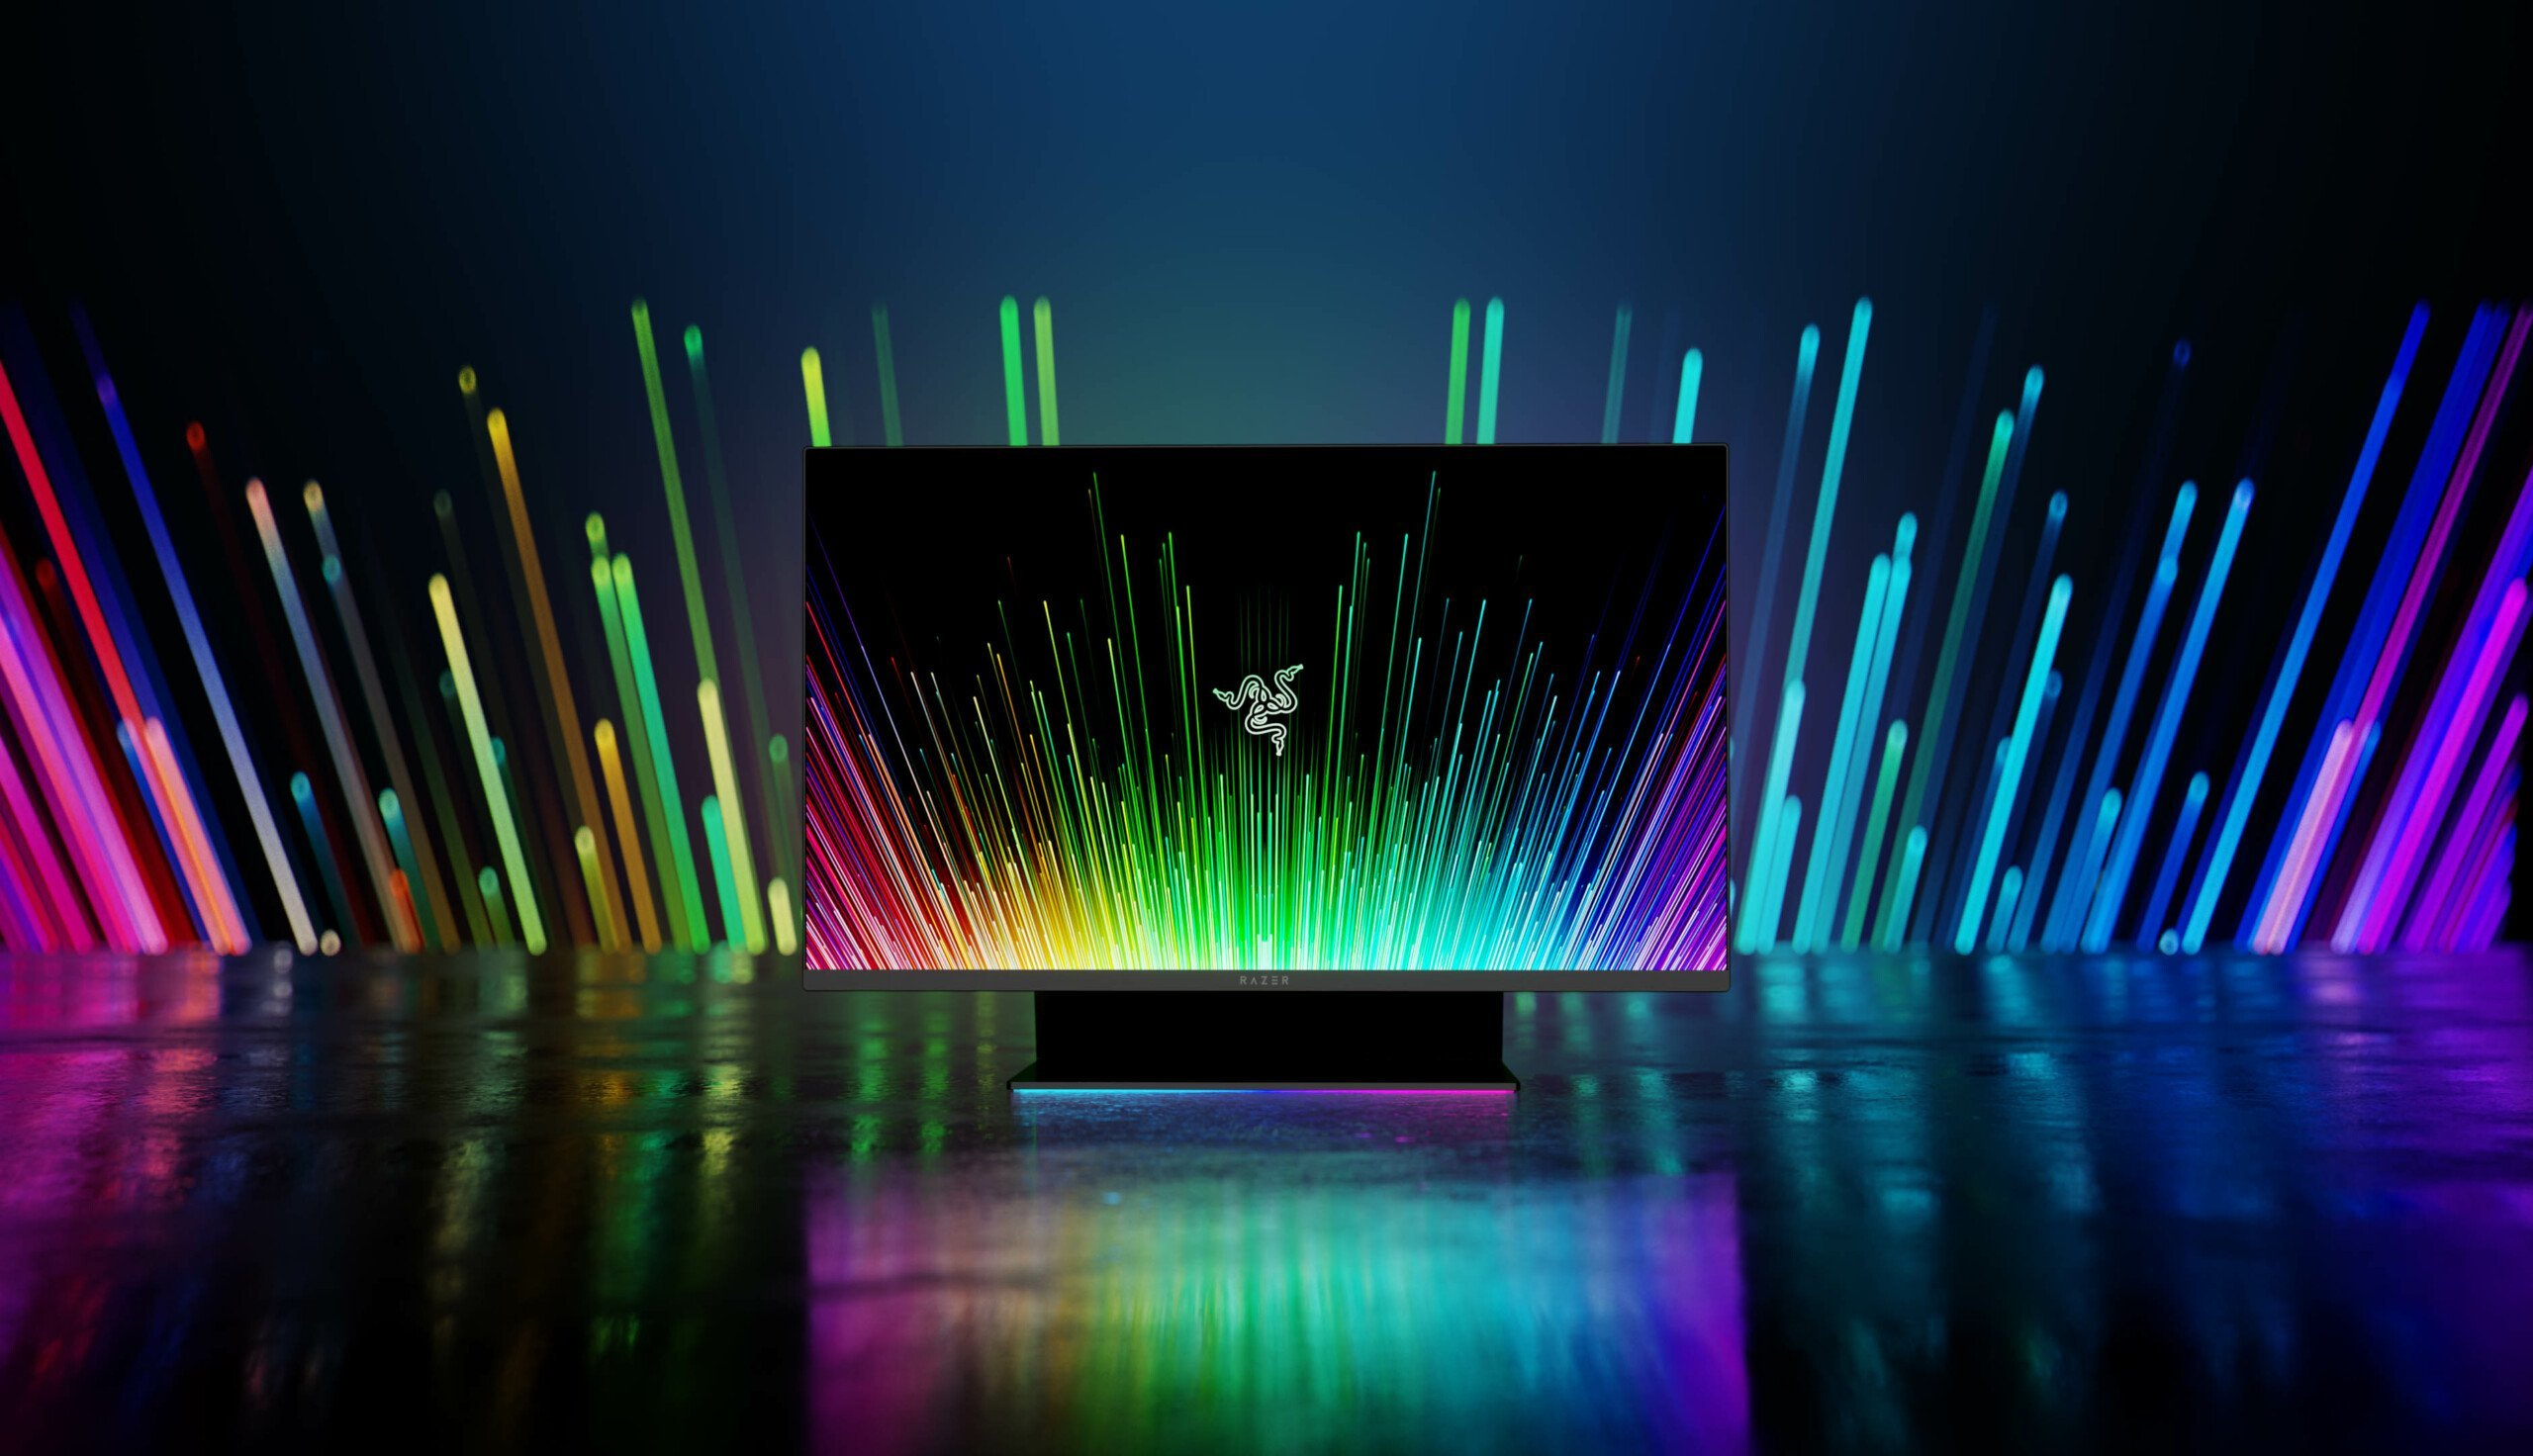 Raptor 27 : l'écran PC de gaming signé Razer est rafraîchi